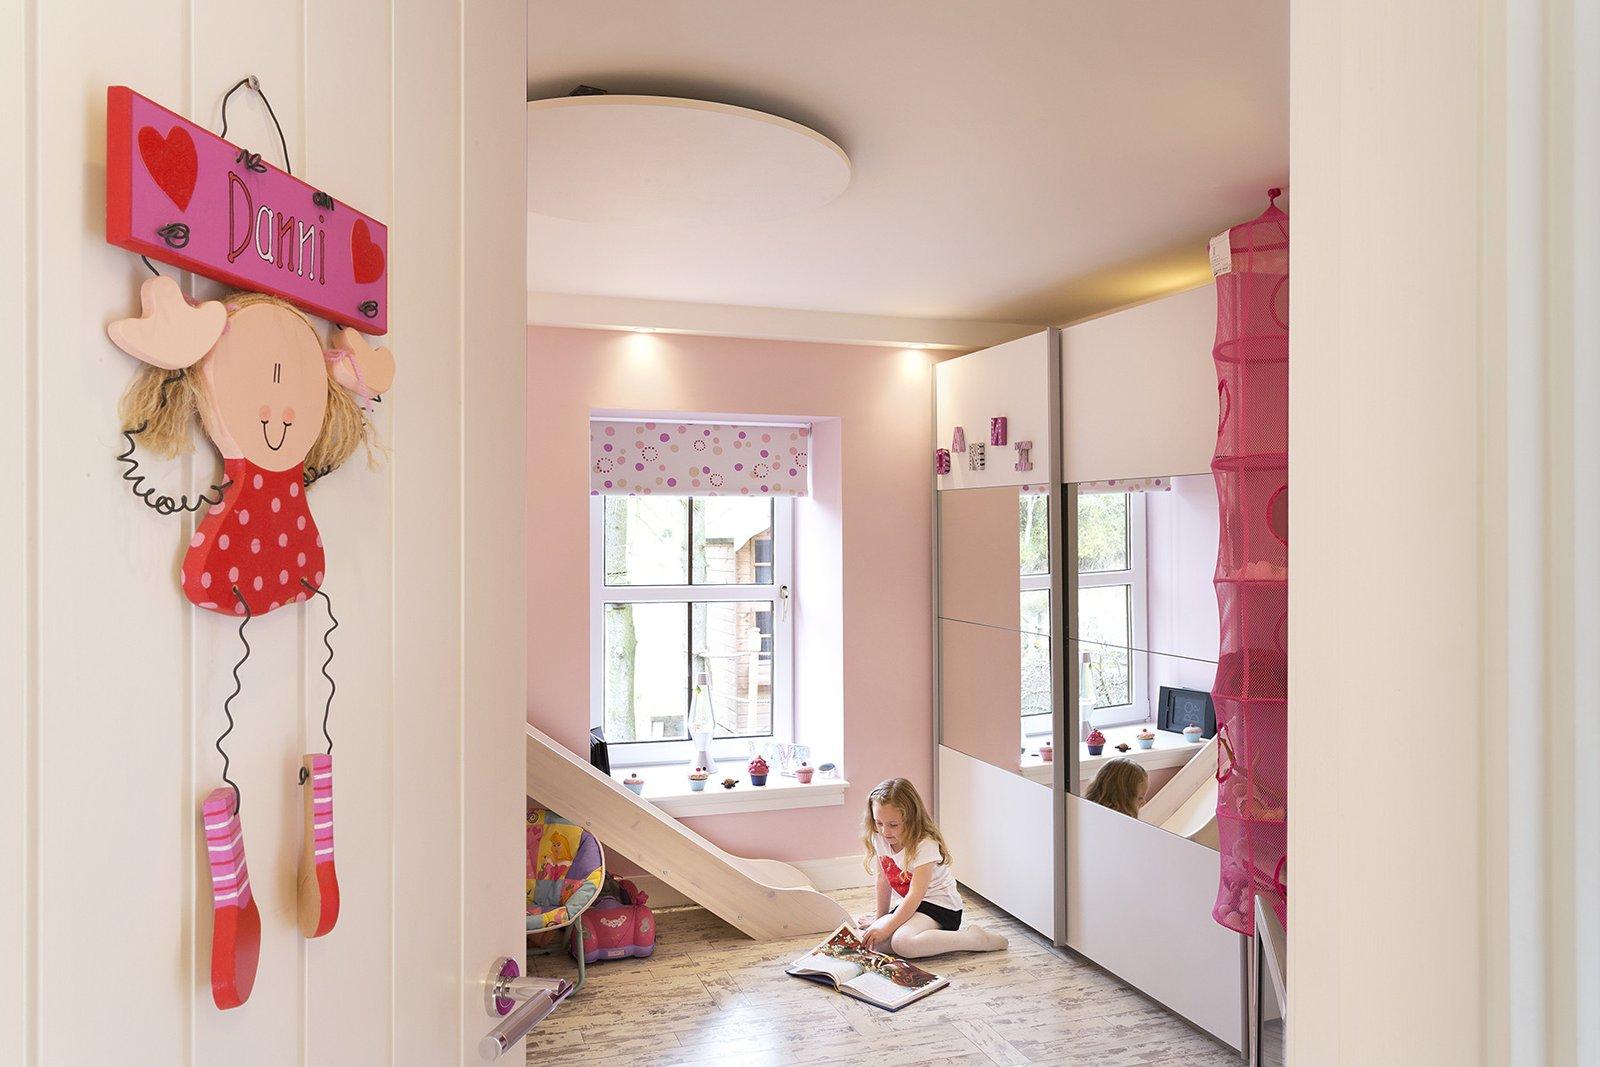 Redwell_infrared_Heater_ceiling_Round_1600x1600